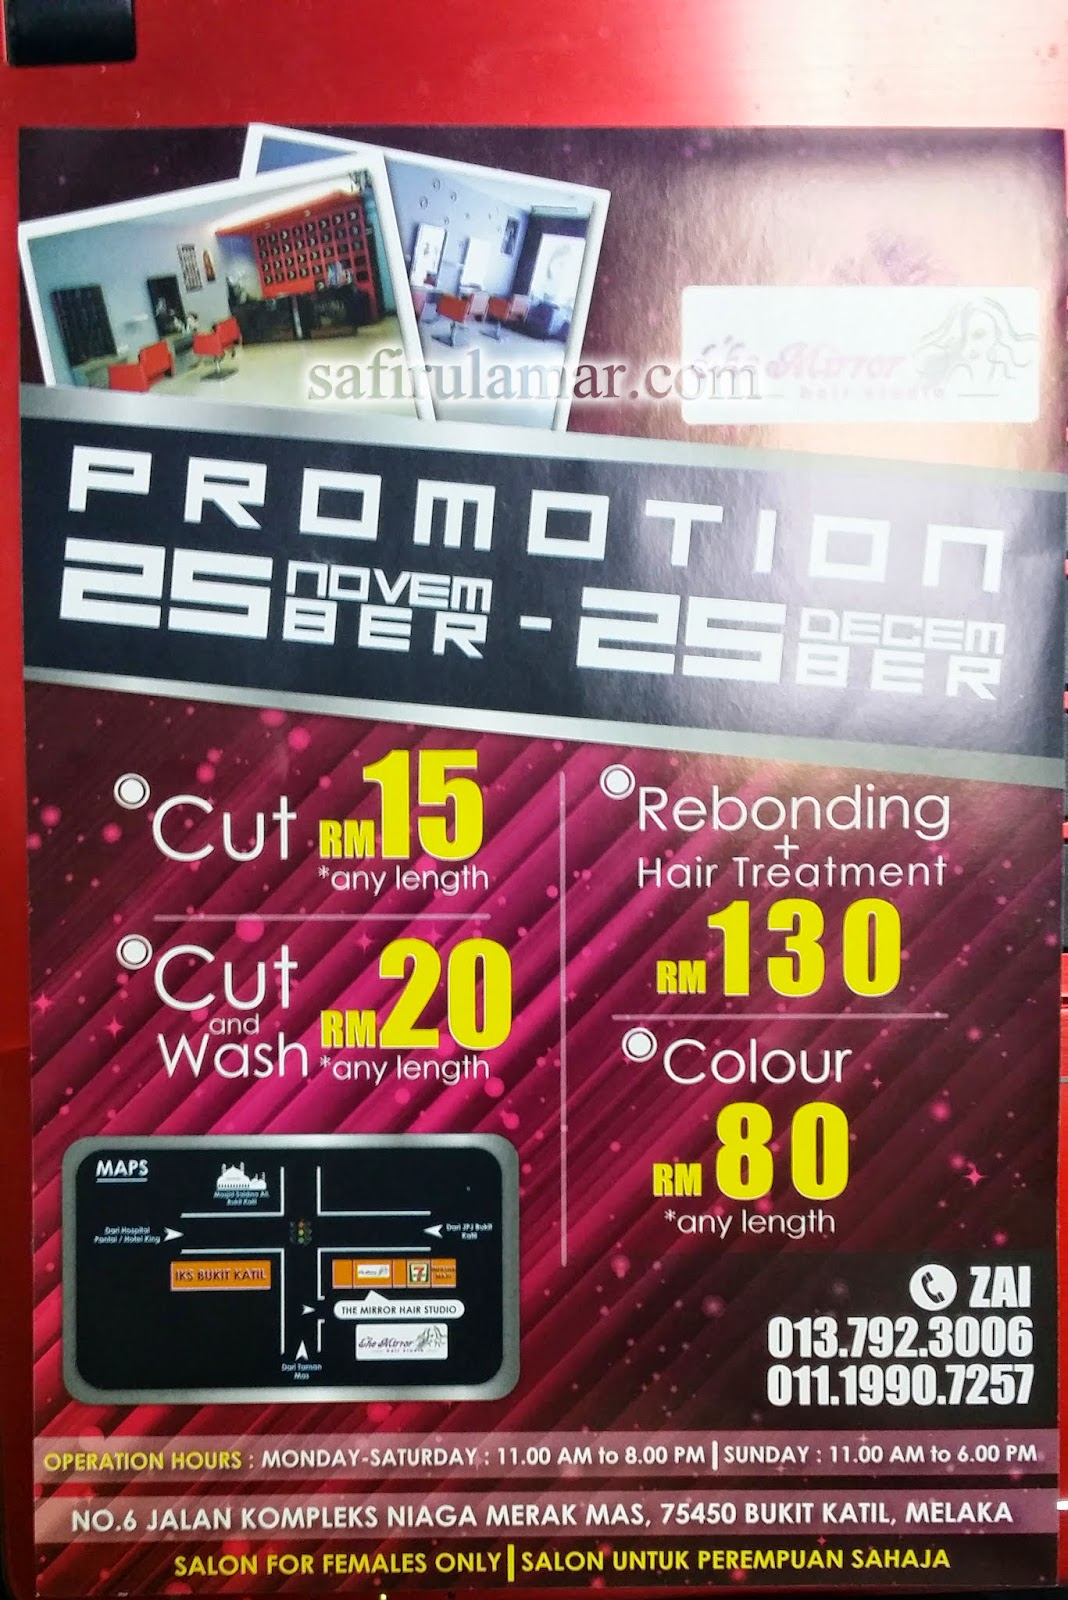 Salon rambut untuk orang perempuan